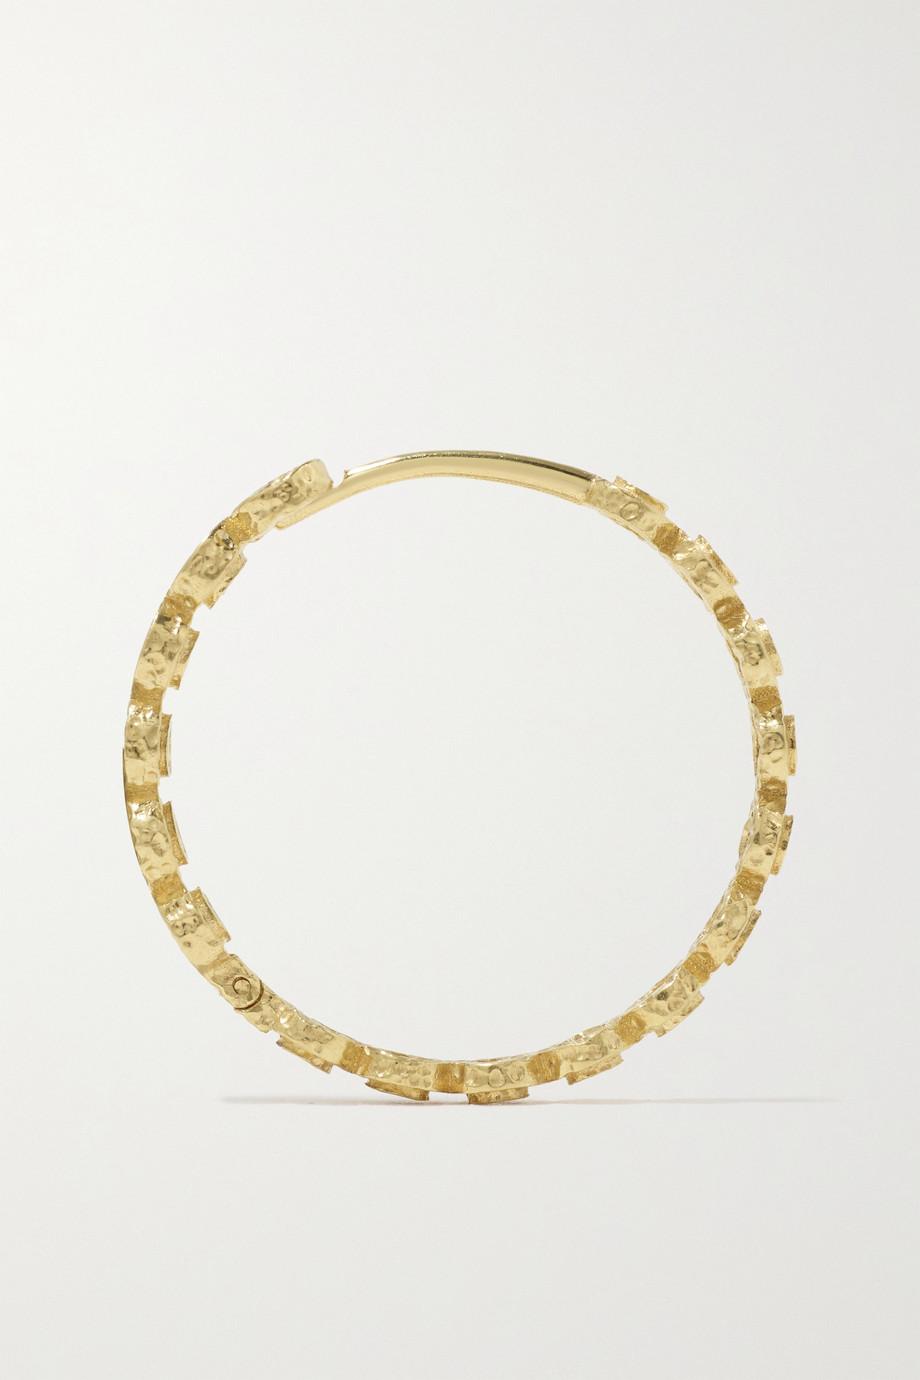 Octavia Elizabeth + NET SUSTAIN Chloe Creolen aus recyceltem 18 Karat Gold mit Diamanten